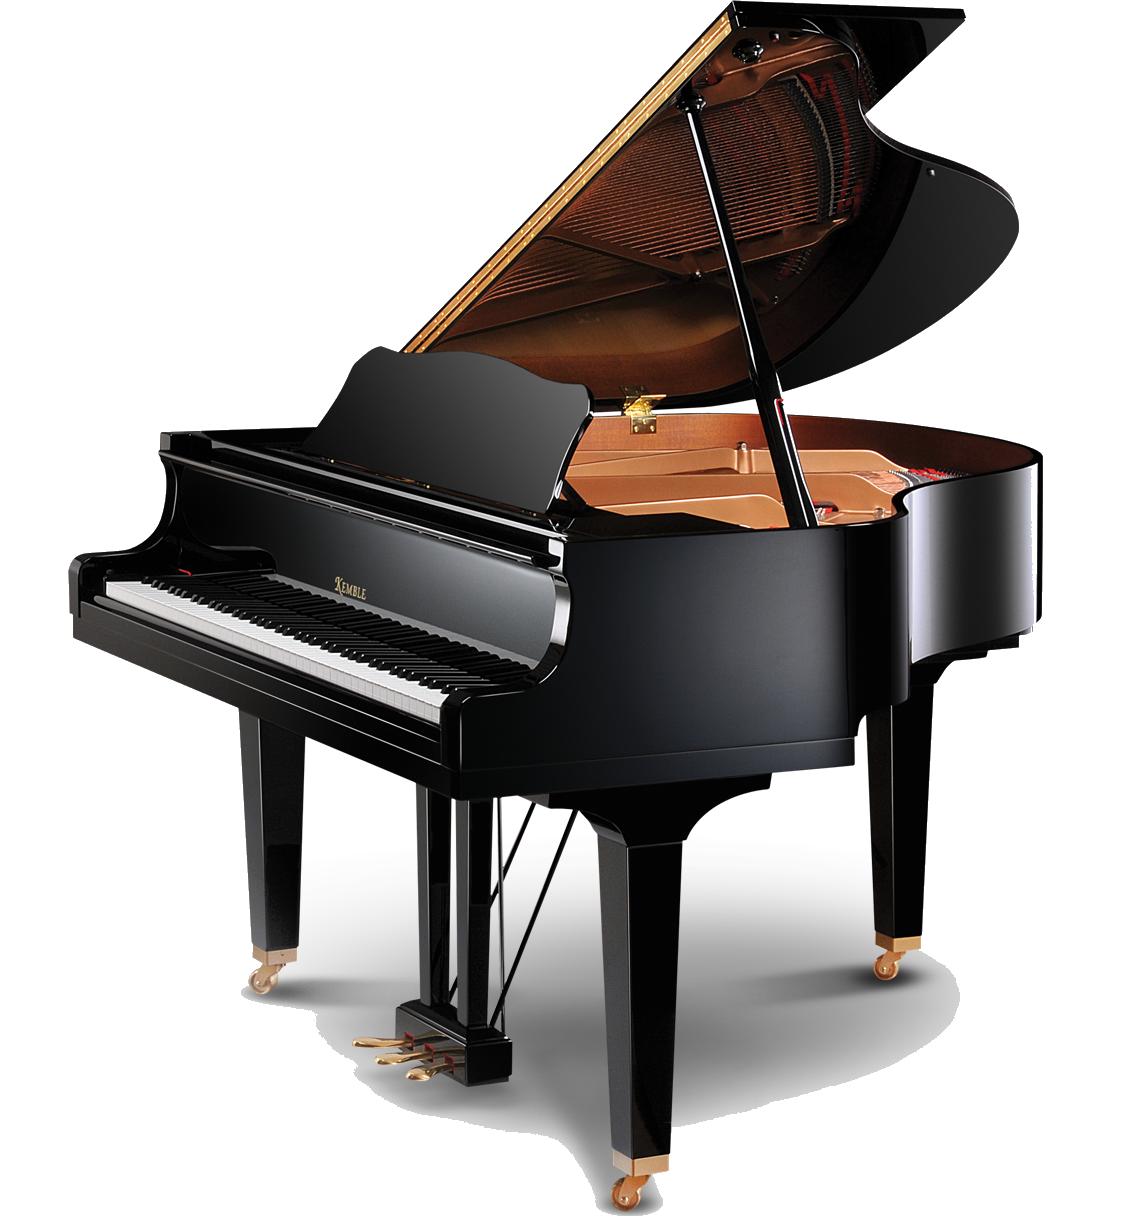 C corporation clipart clipart free library Grand piano upright piano Yamaha Corporation C. Bechstein - Piano ... clipart free library